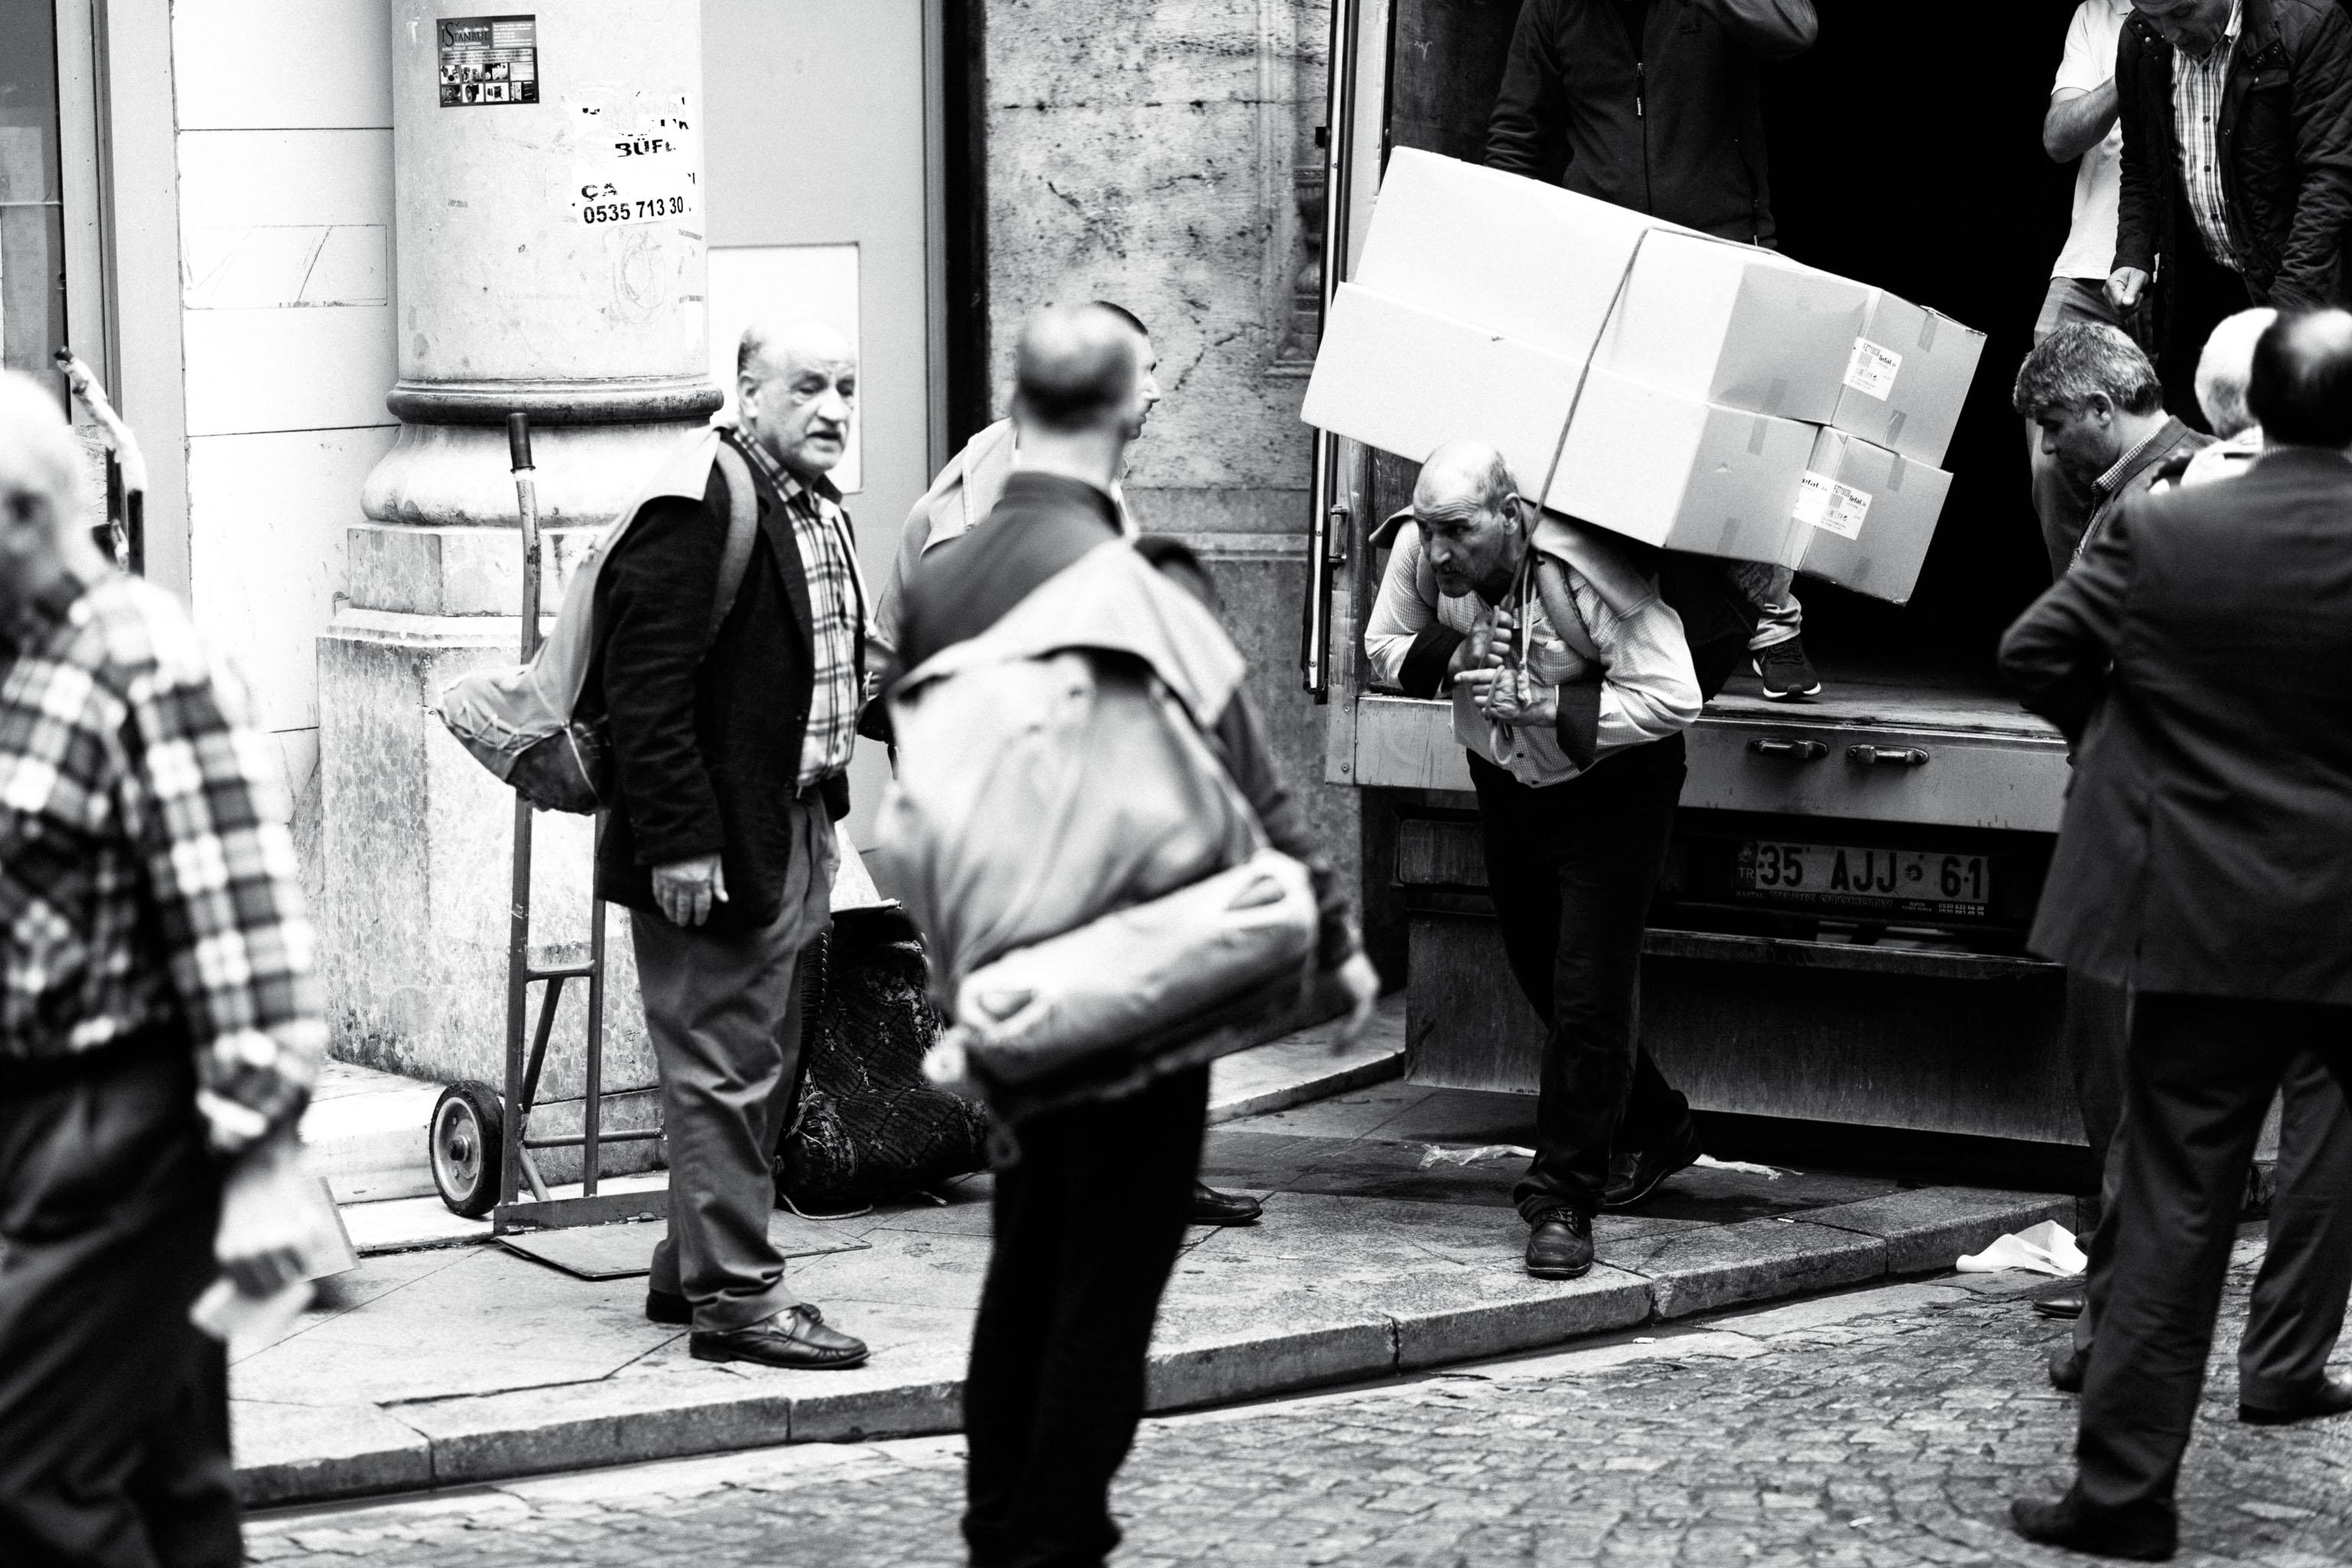 Sven-Michael---S-2018--12-[working-streets]---©-Sven-Michael-Golimowski.jpg